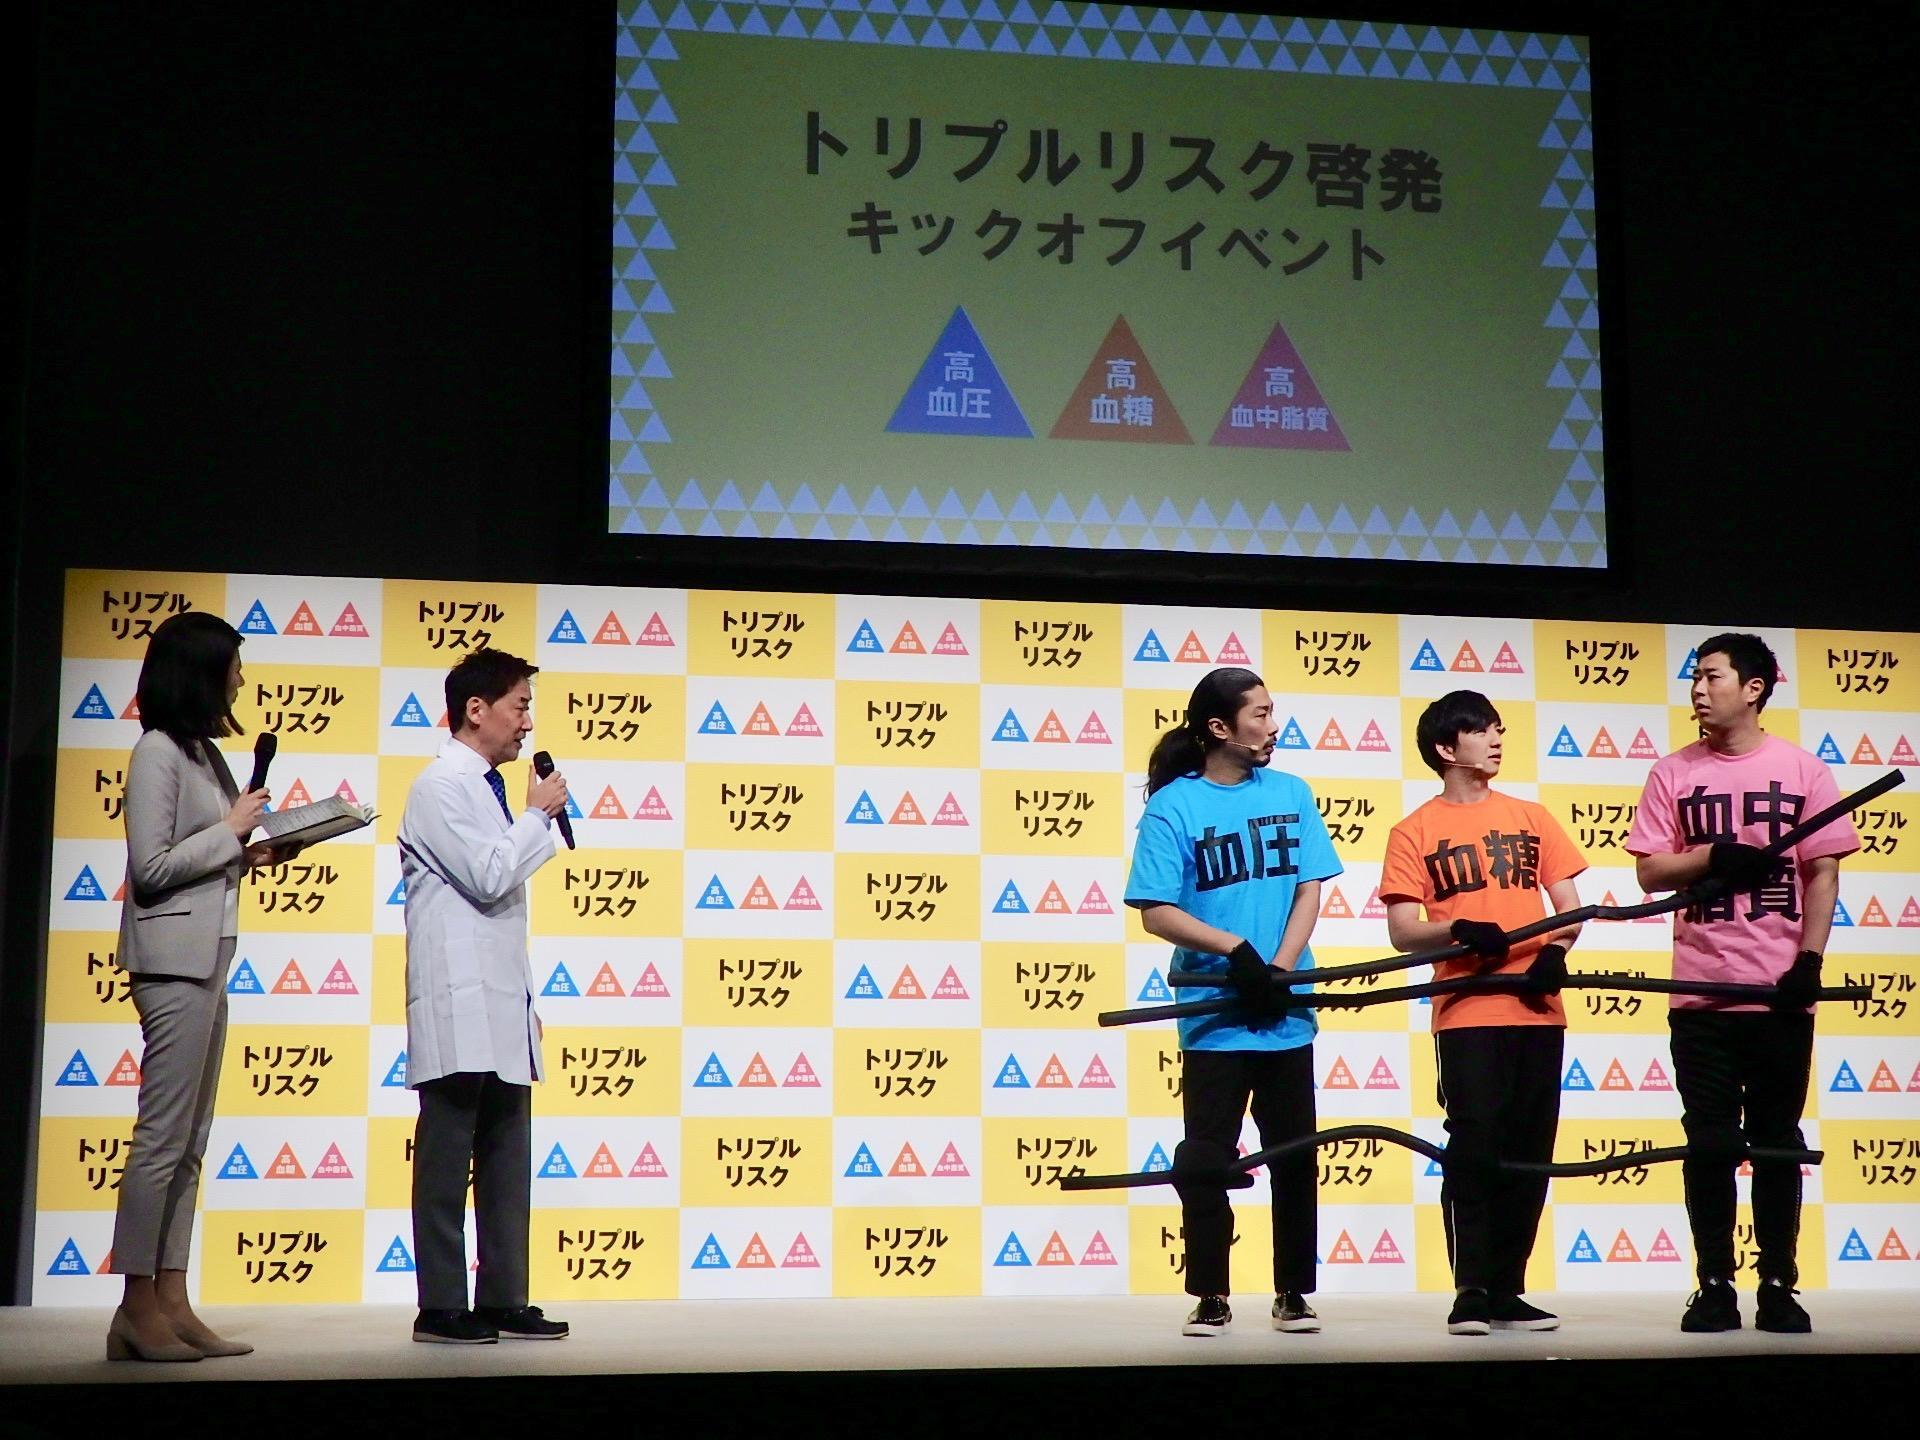 http://news.yoshimoto.co.jp/20180227231109-5f09a11bf240960ccc66638d21579197175d9c0f.jpg